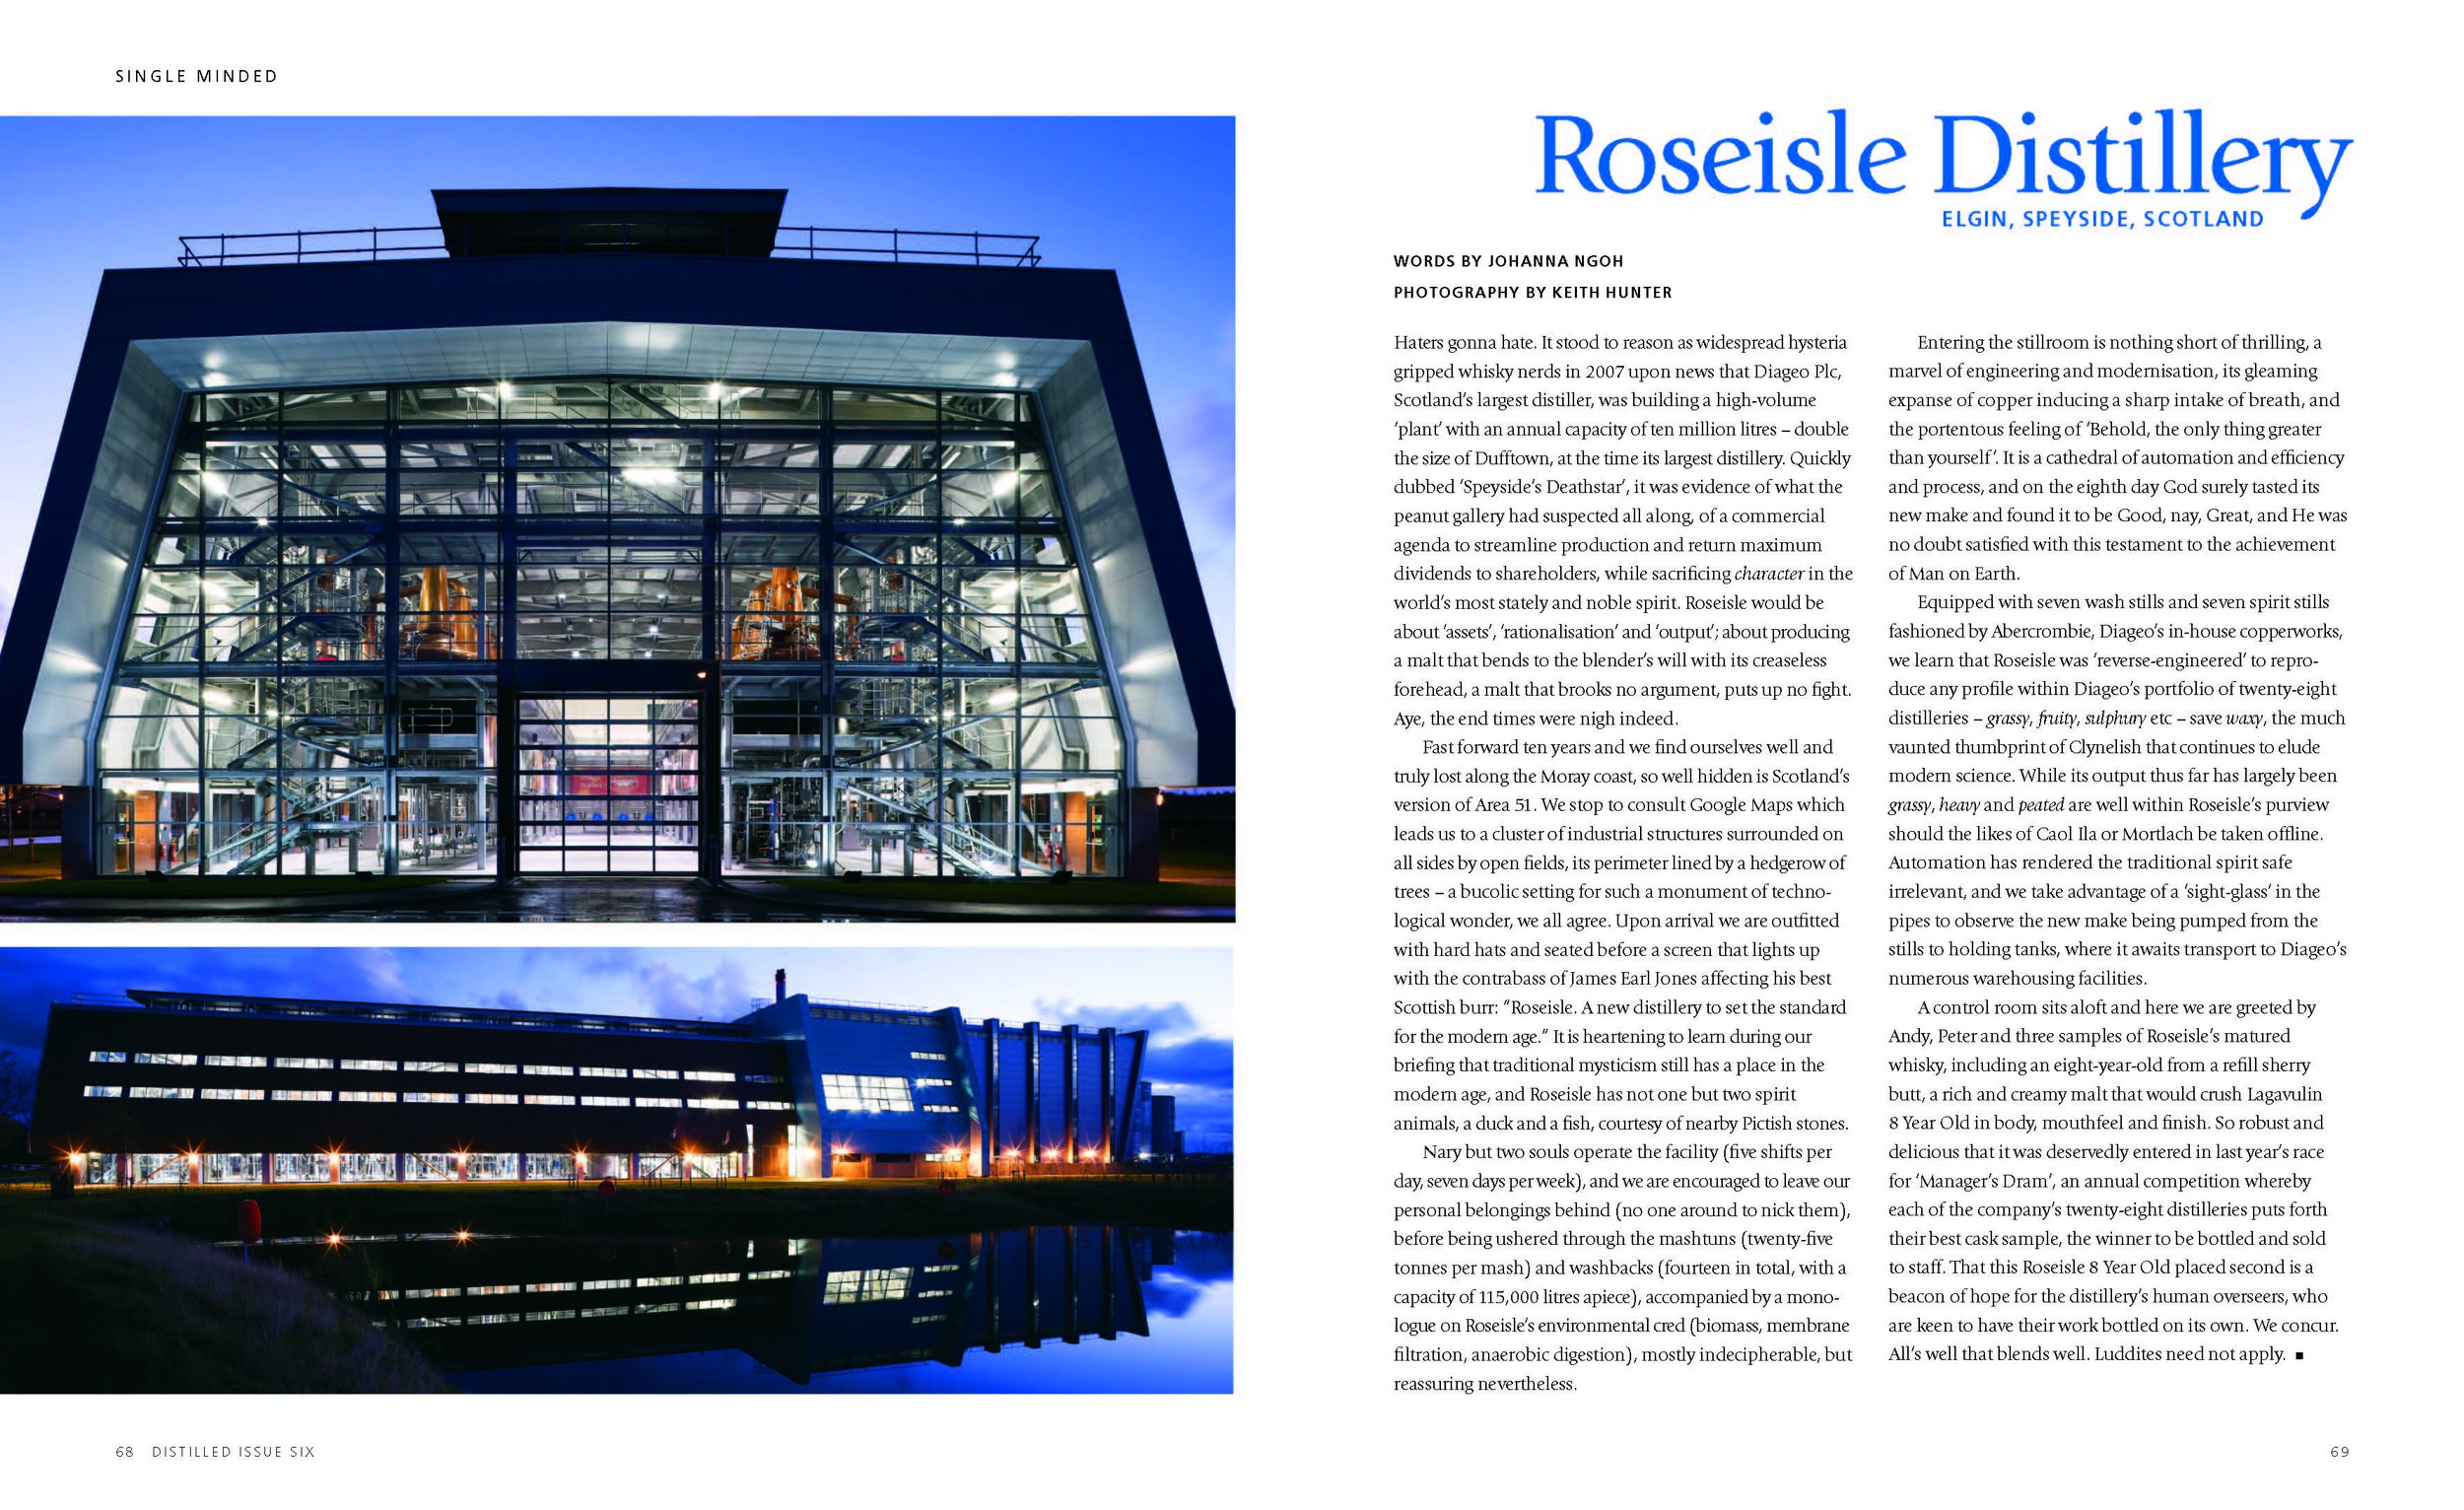 Distilled-IssueSix-Interior-Final-Nov14_Page_35.jpg